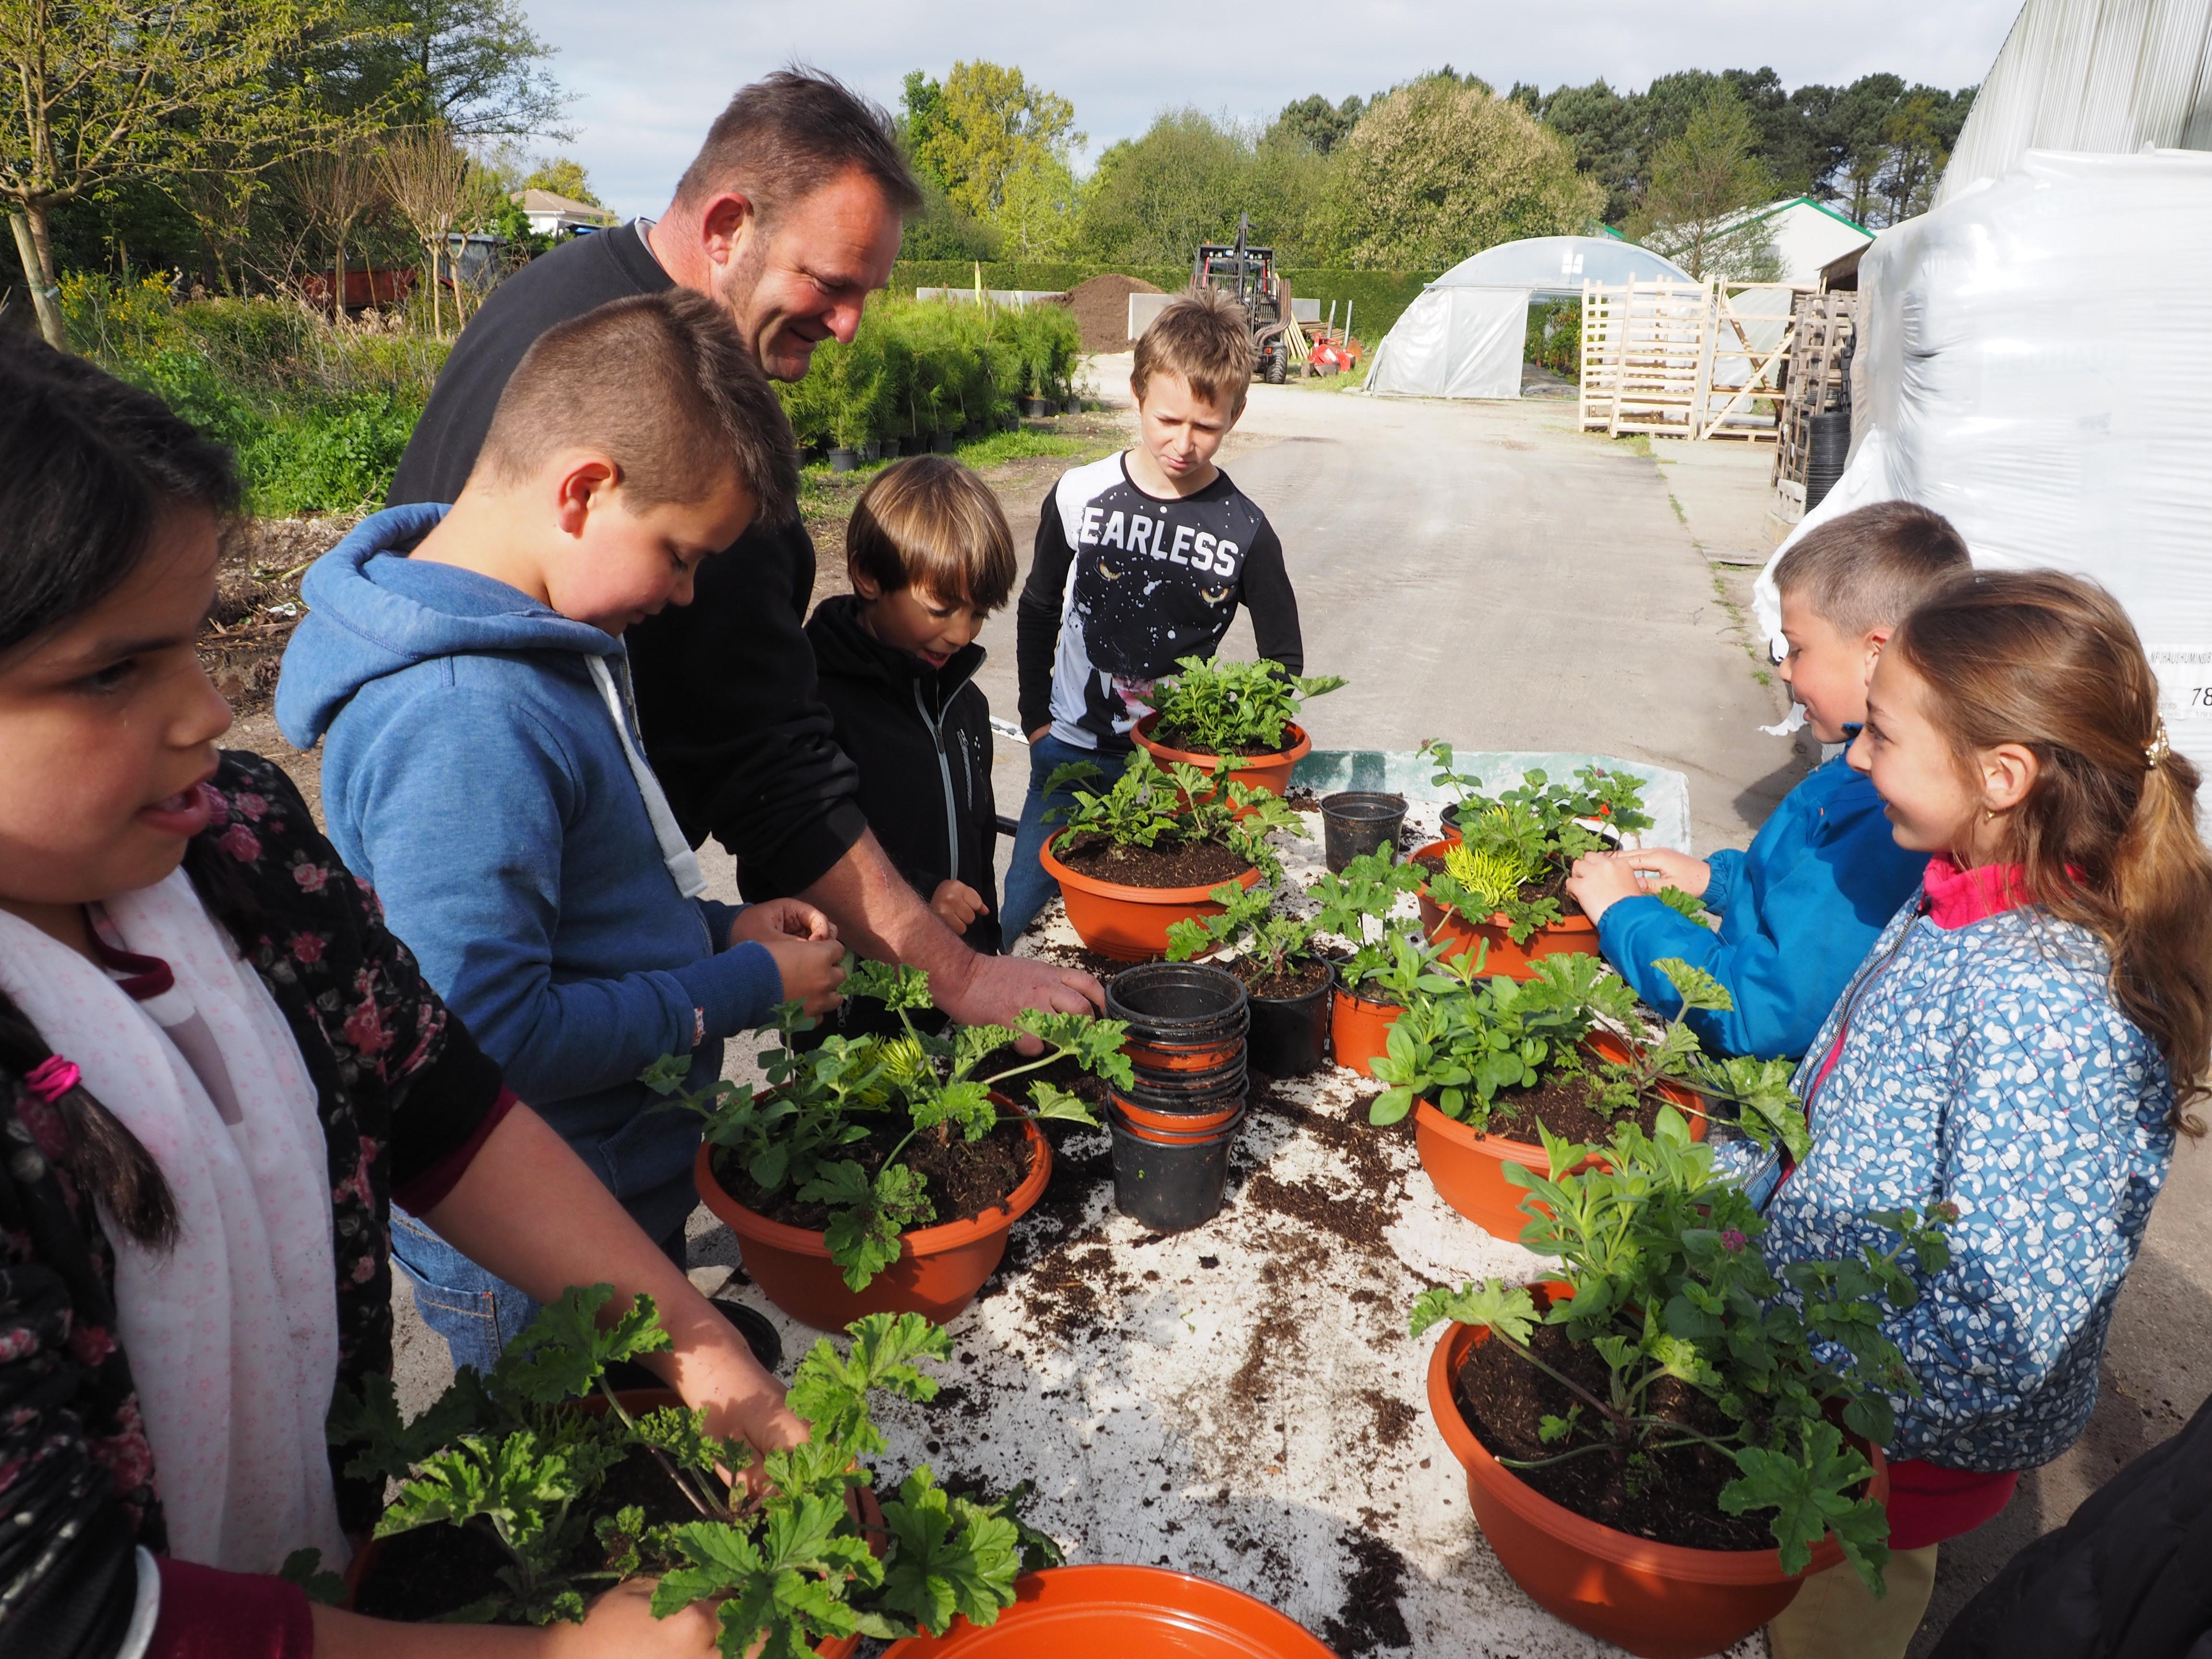 Animation enfants: Viens tester le métier de jardinier